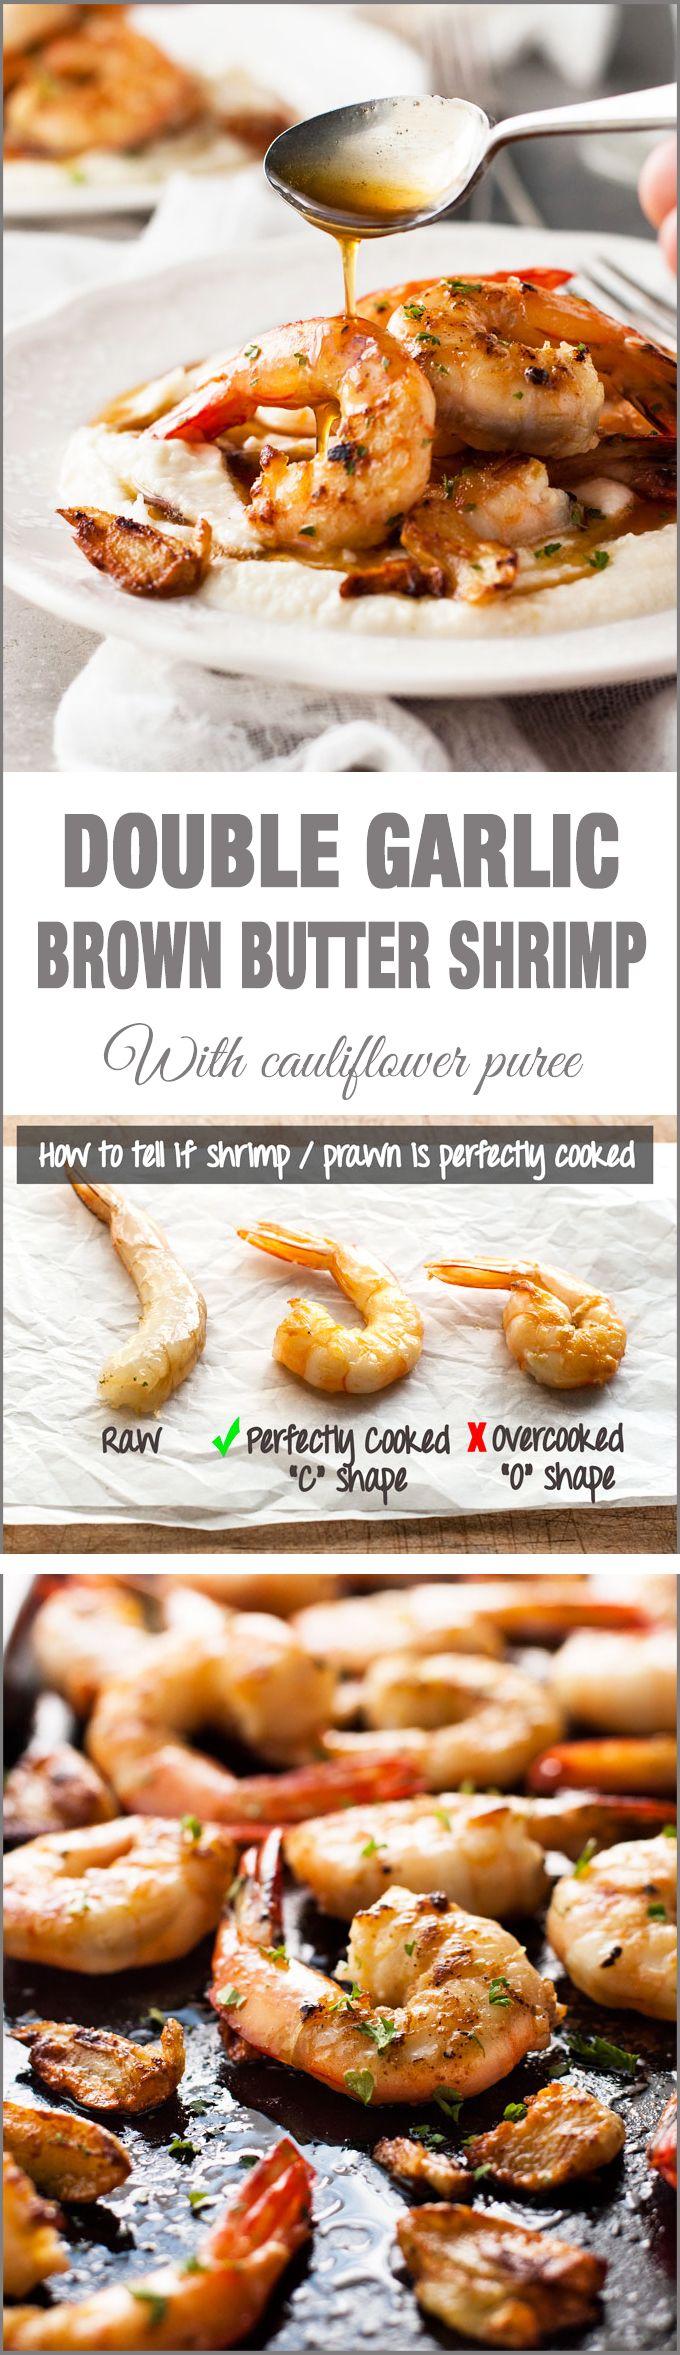 Double Garlic Brown Butter Shrimp (Prawns) - garlic prawns with garlic infused brown butter. Simple and fast to make, but so elegant!